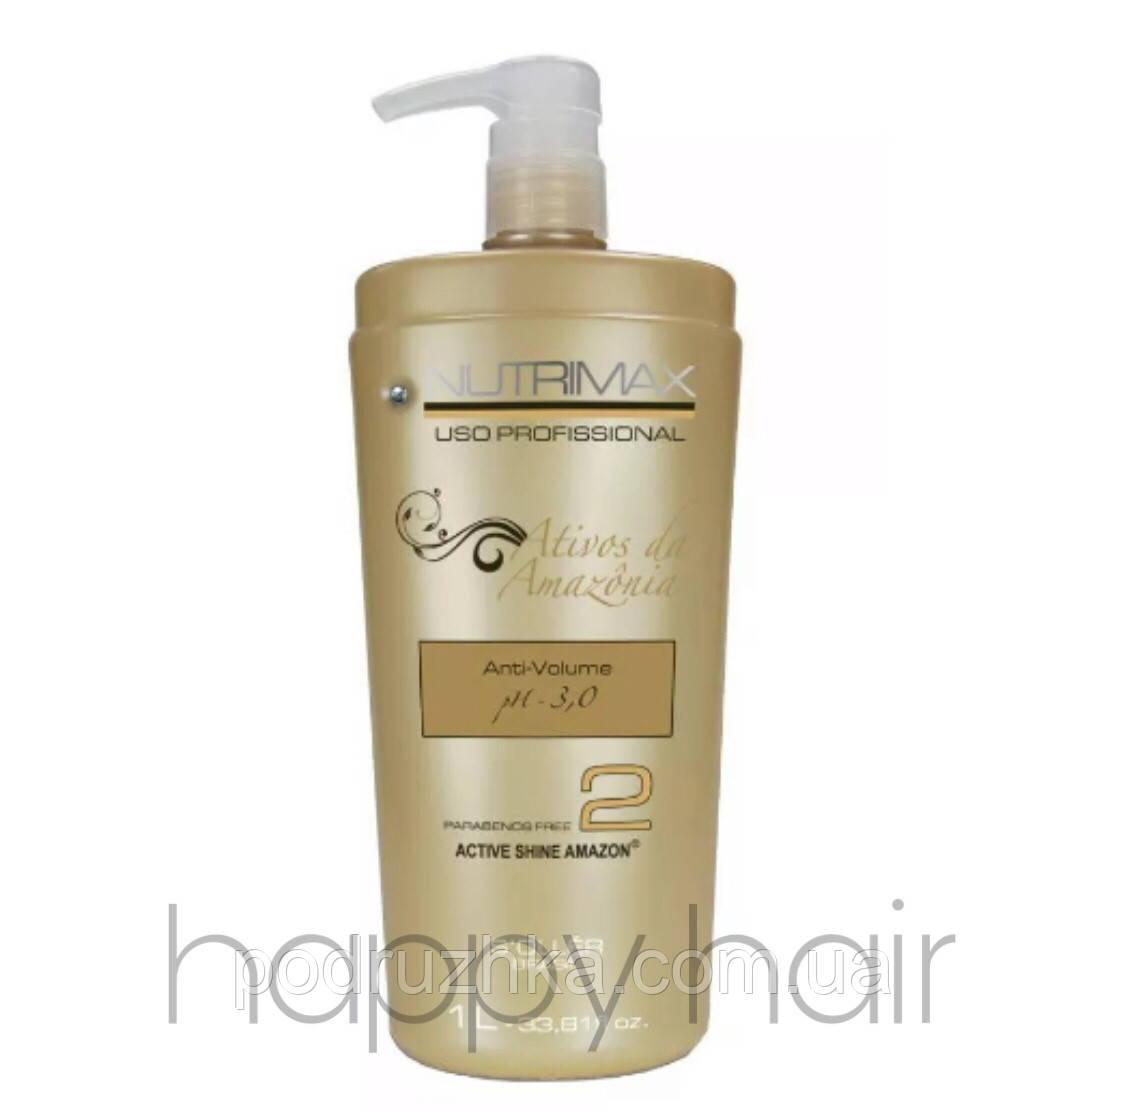 Кератин для волос Nutrimax Soller (шаг 2) 500 г